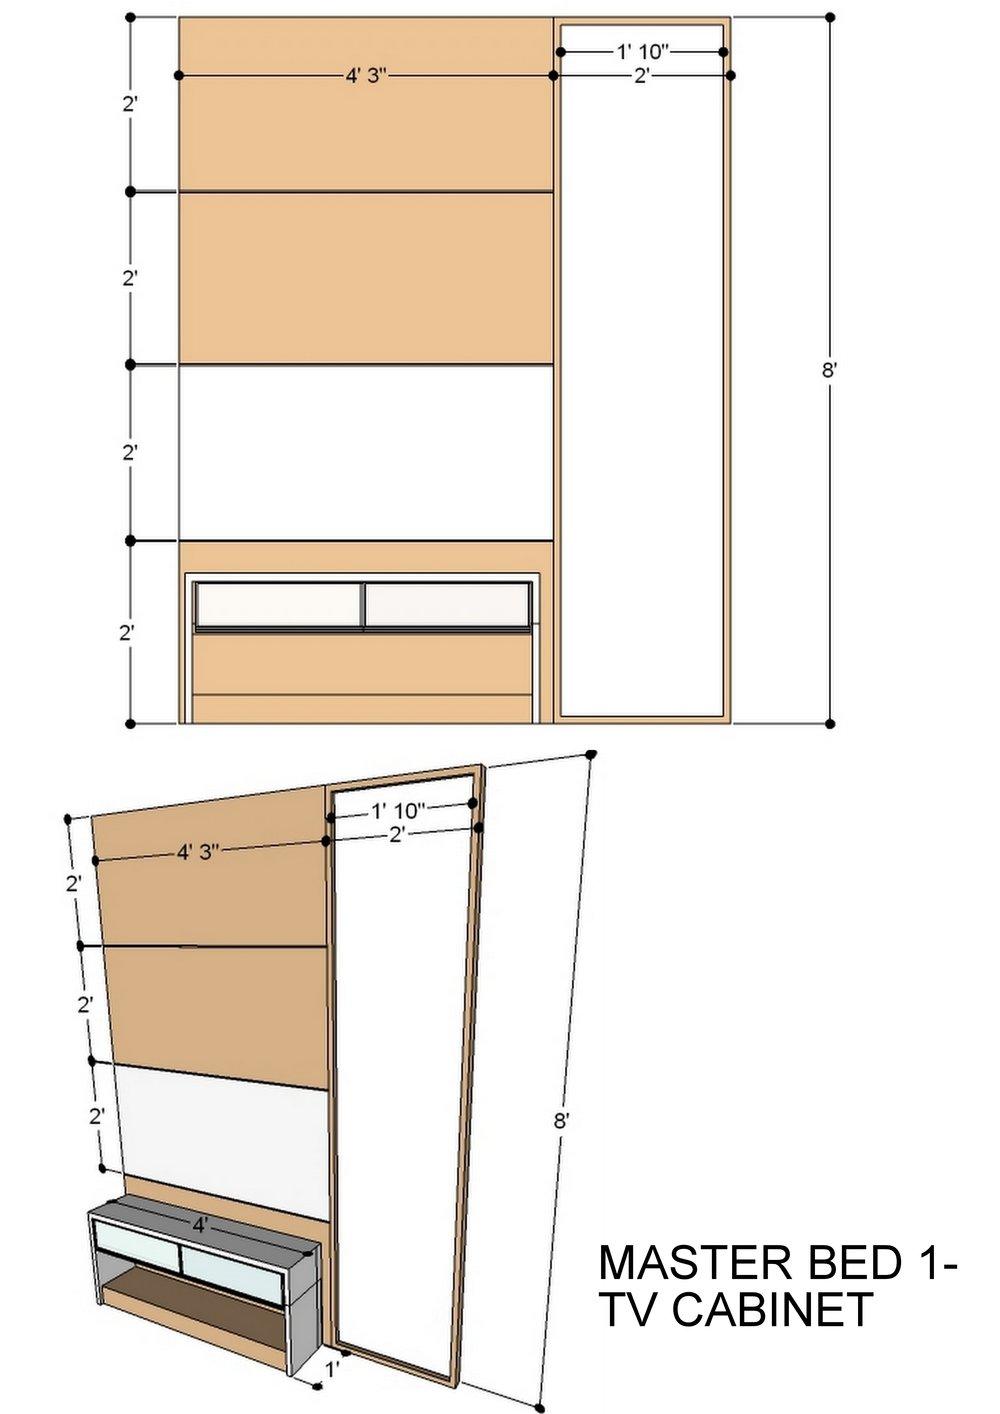 MASTER BED 1 - TV CABINET.jpg